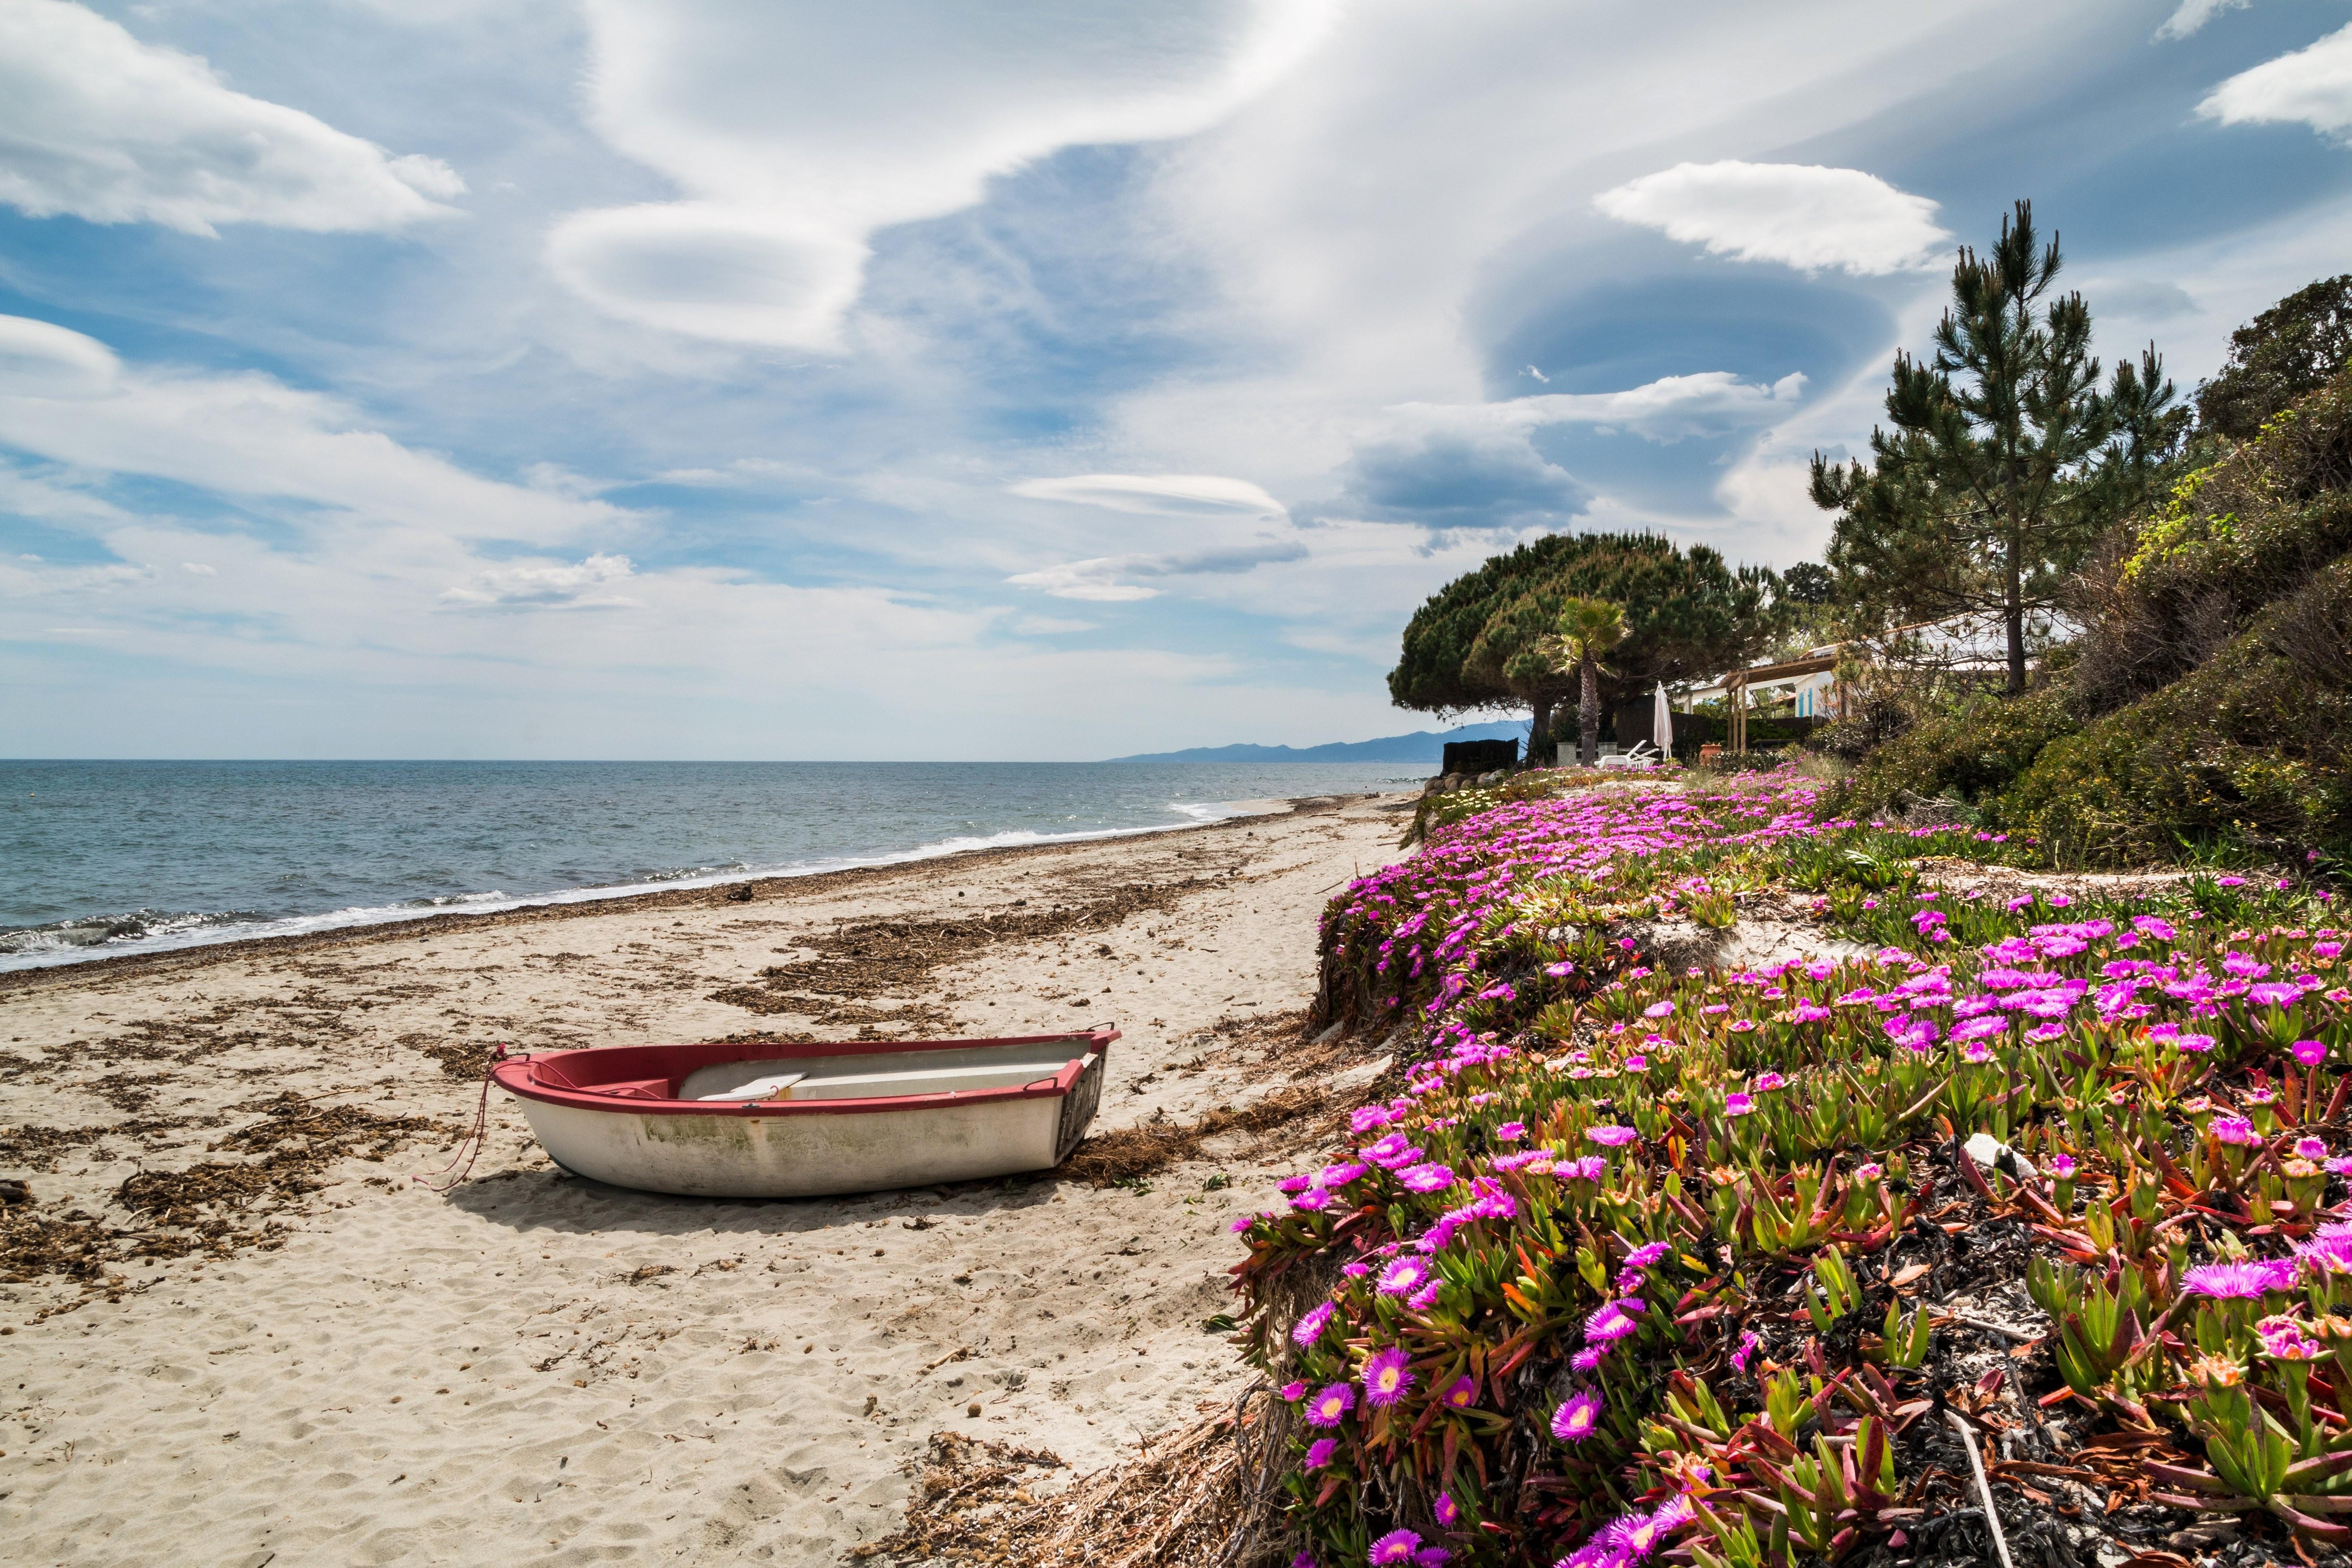 Colourful Boatsfrance Sky Portulaca Coast Wallpaper Nature 5250x3500